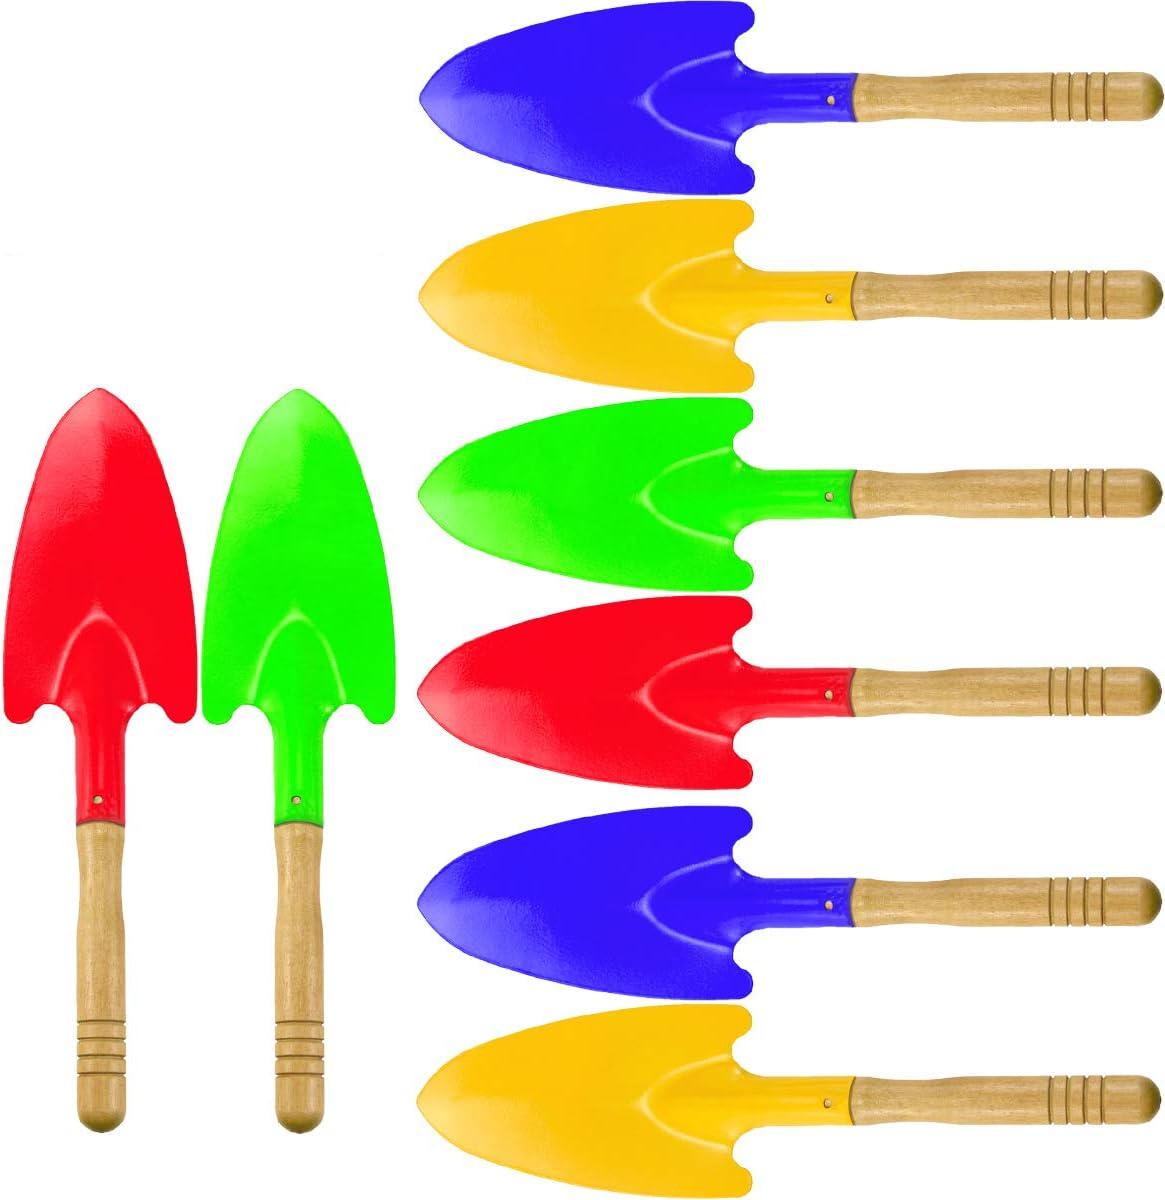 Hslife 8 Pieces 11'' Max 85% OFF Toy Shovels Fresno Mall Kids Tools W Shovel Garden Mini